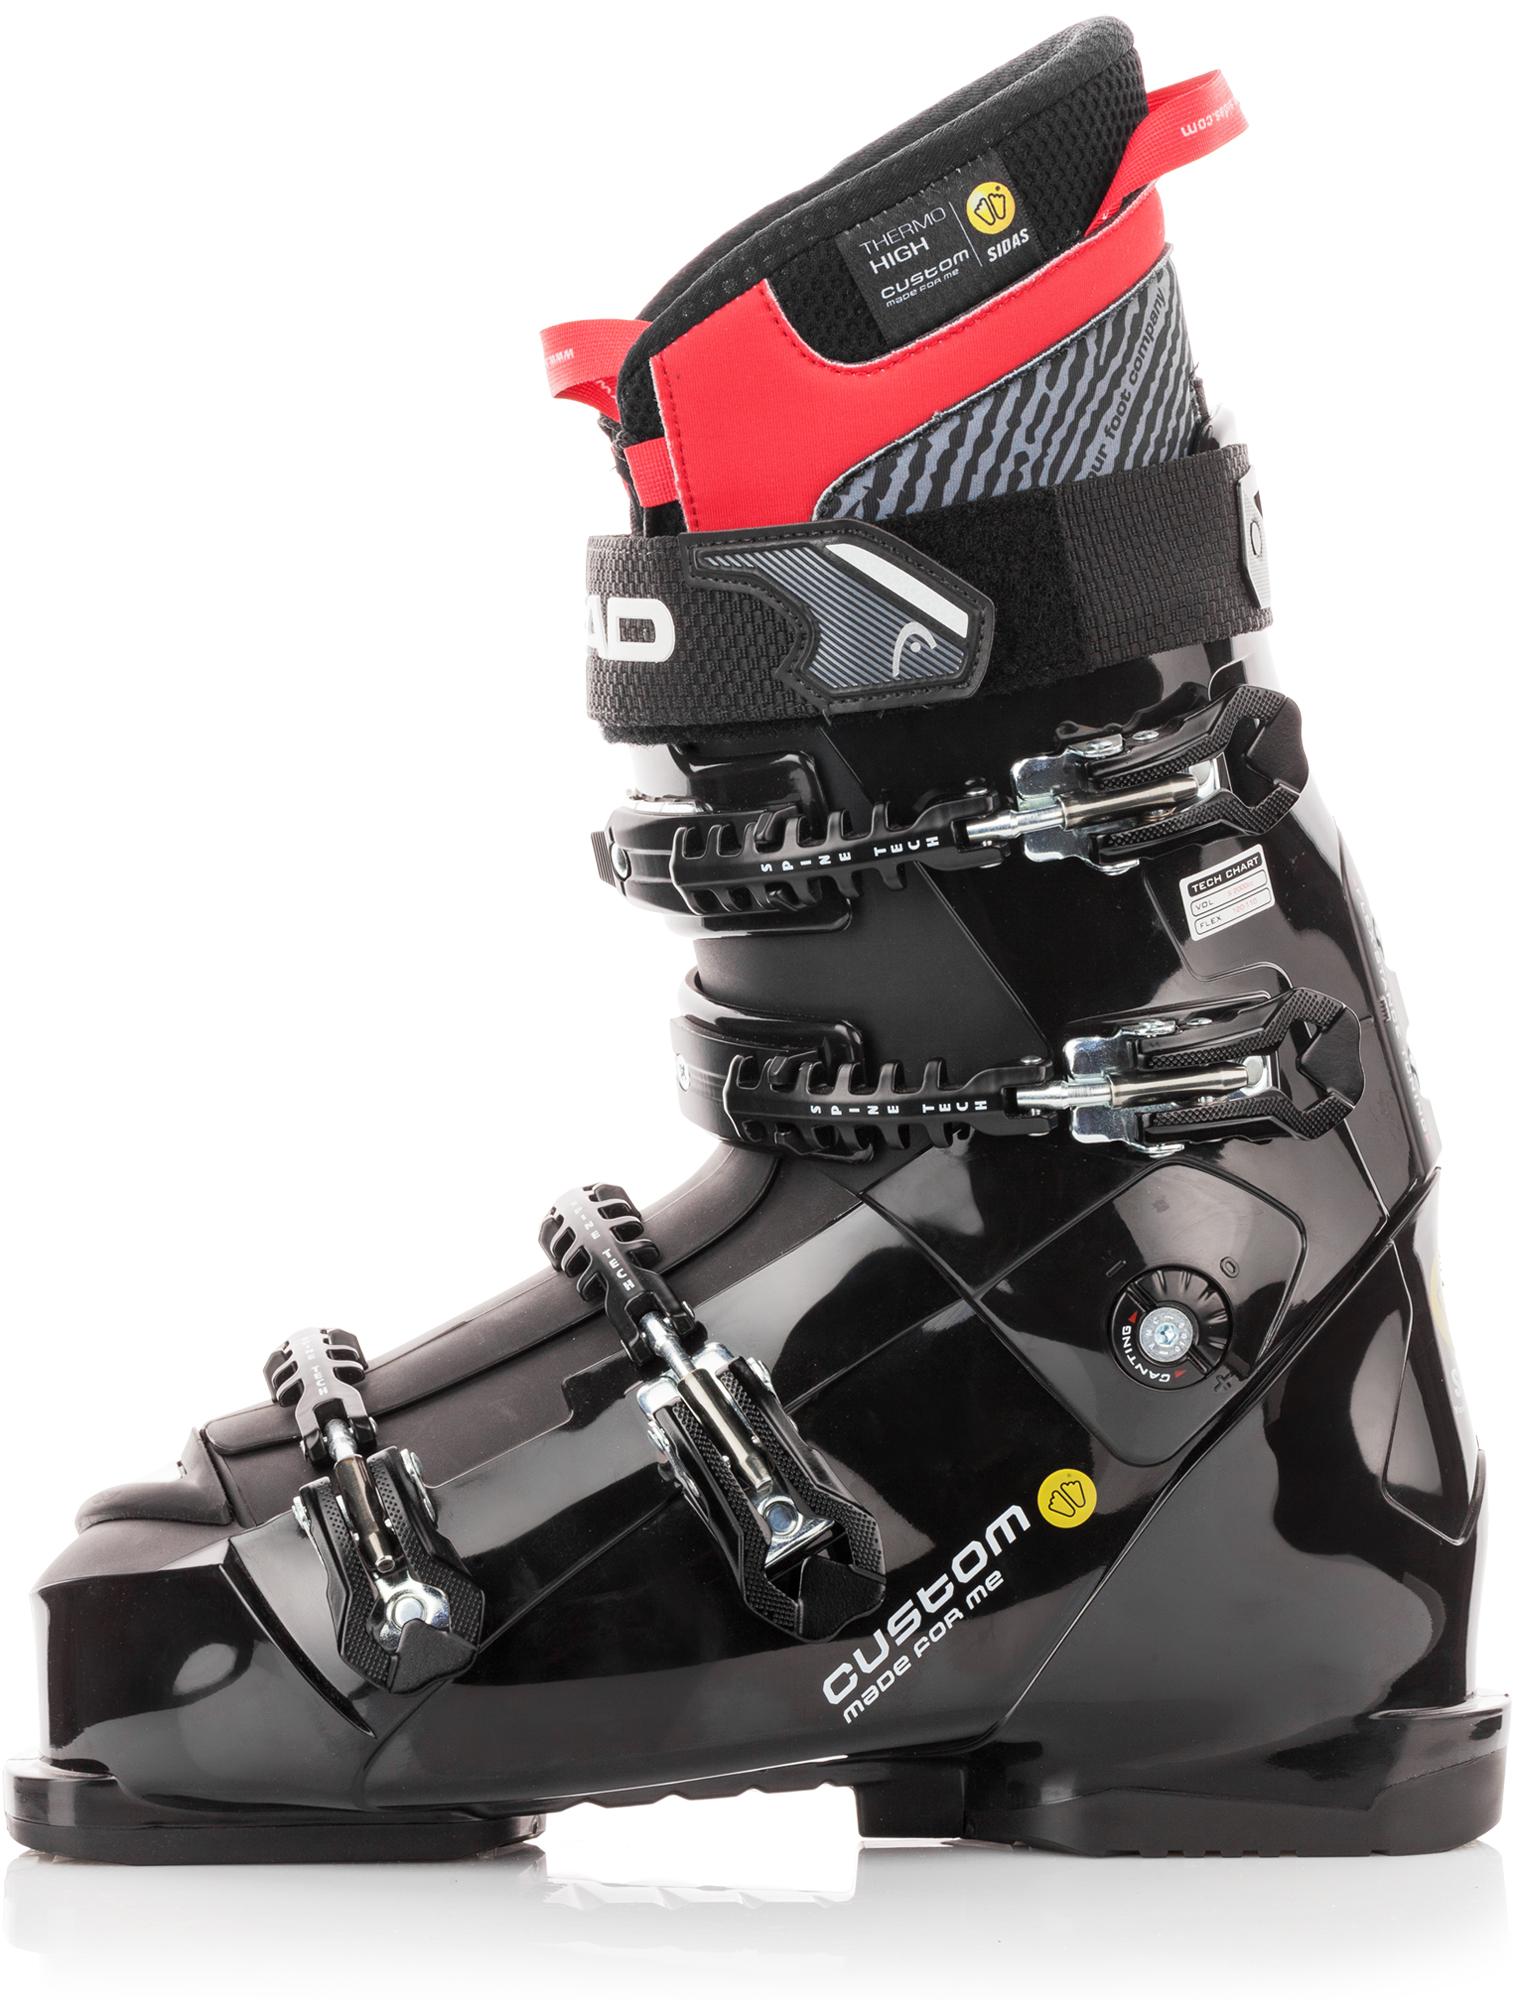 Sidas Ботинки горнолыжные Vector + Central High, размер 46